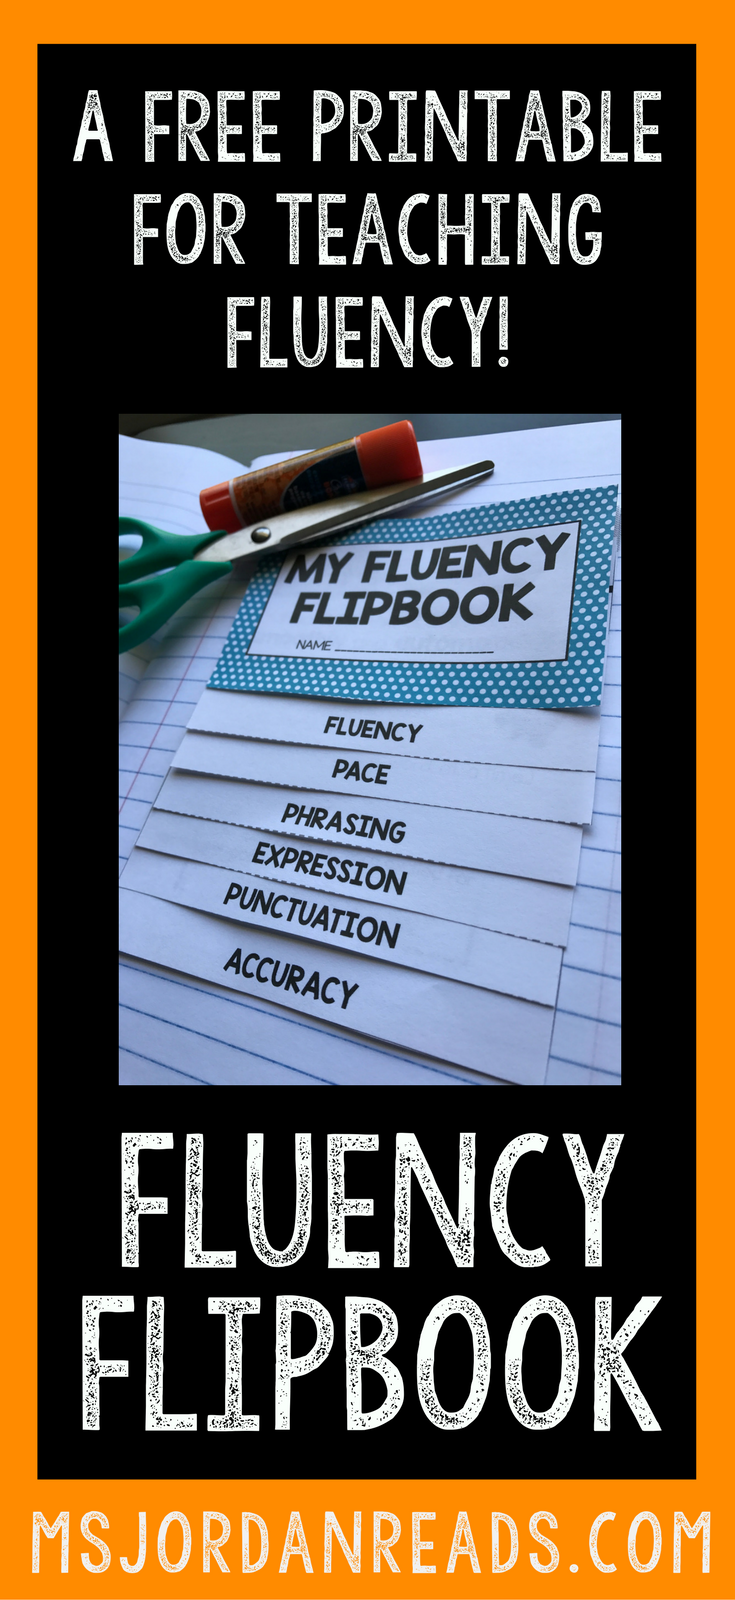 Fluency Flipbooks For The Classroom Teaching Fluency Fluency Activities Fluency [ 1600 x 735 Pixel ]